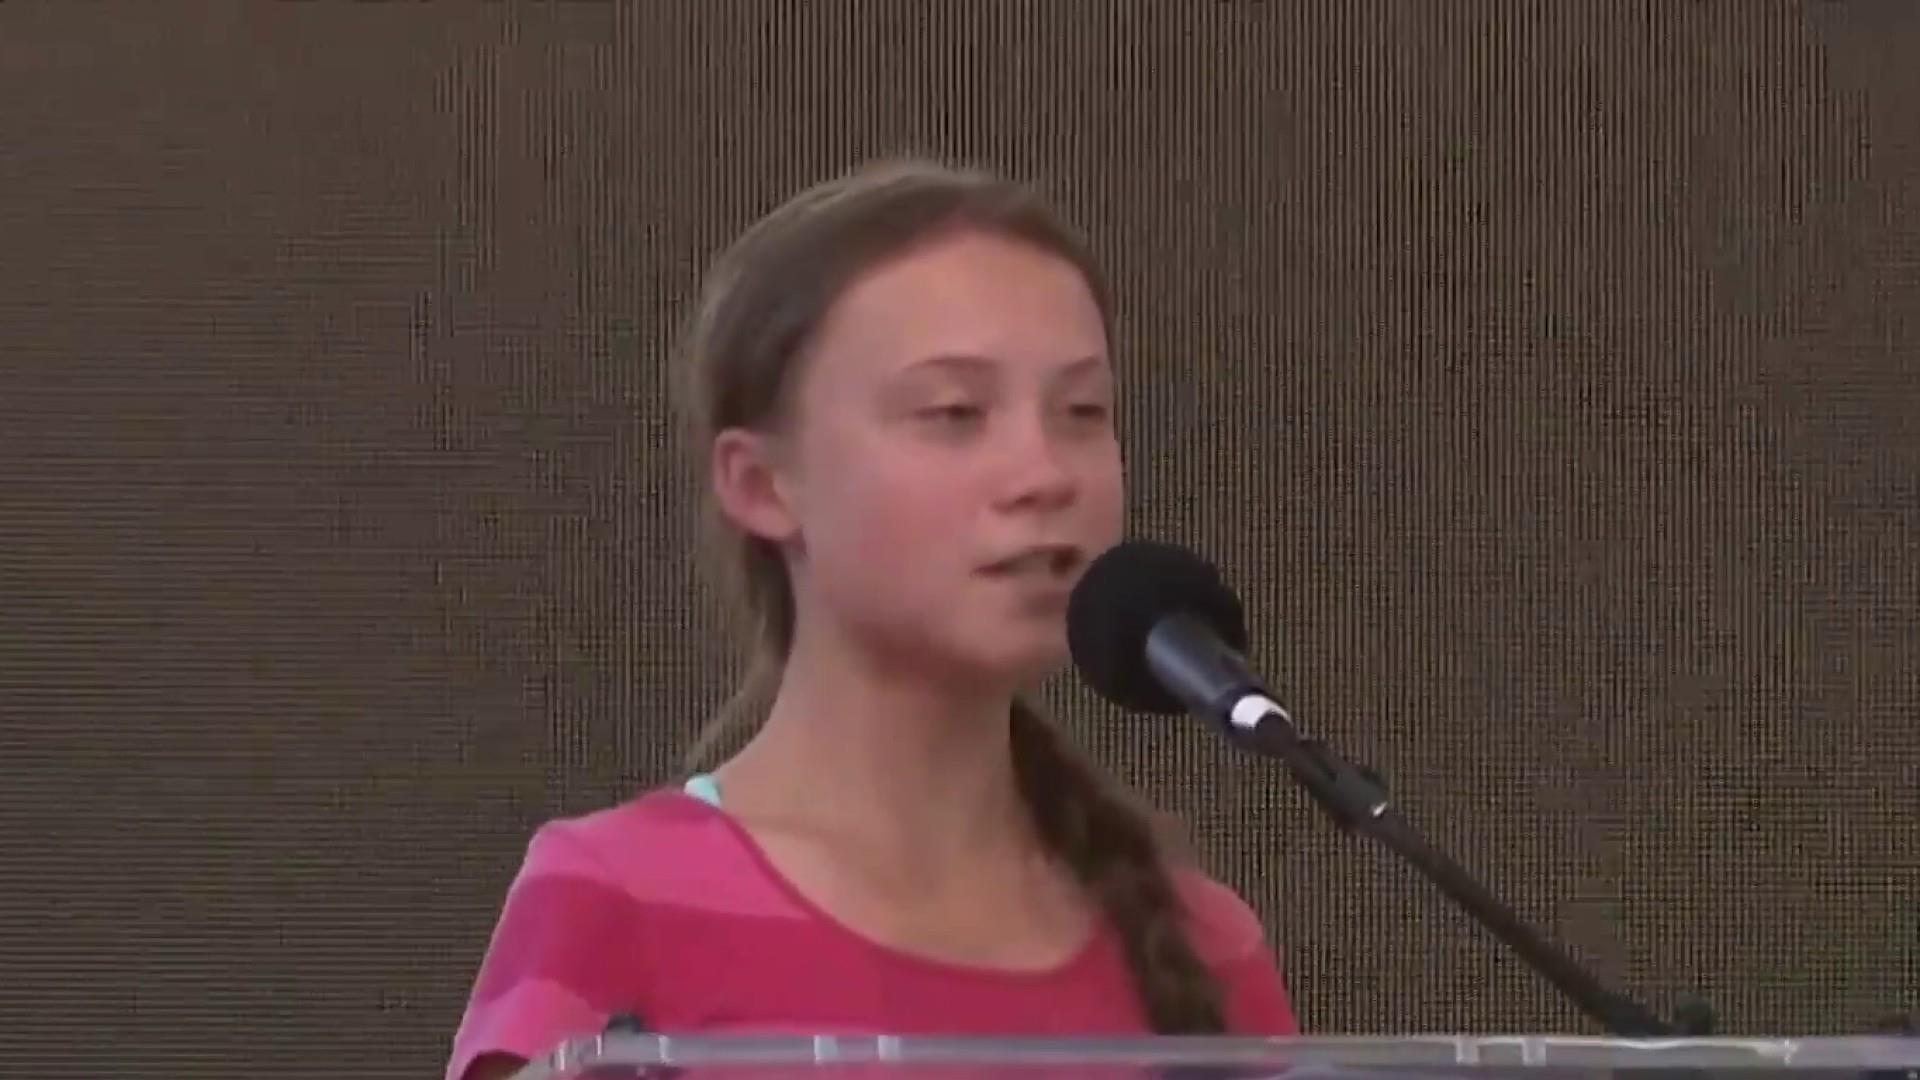 Teen activist Greta Thunberg leads global climate protest